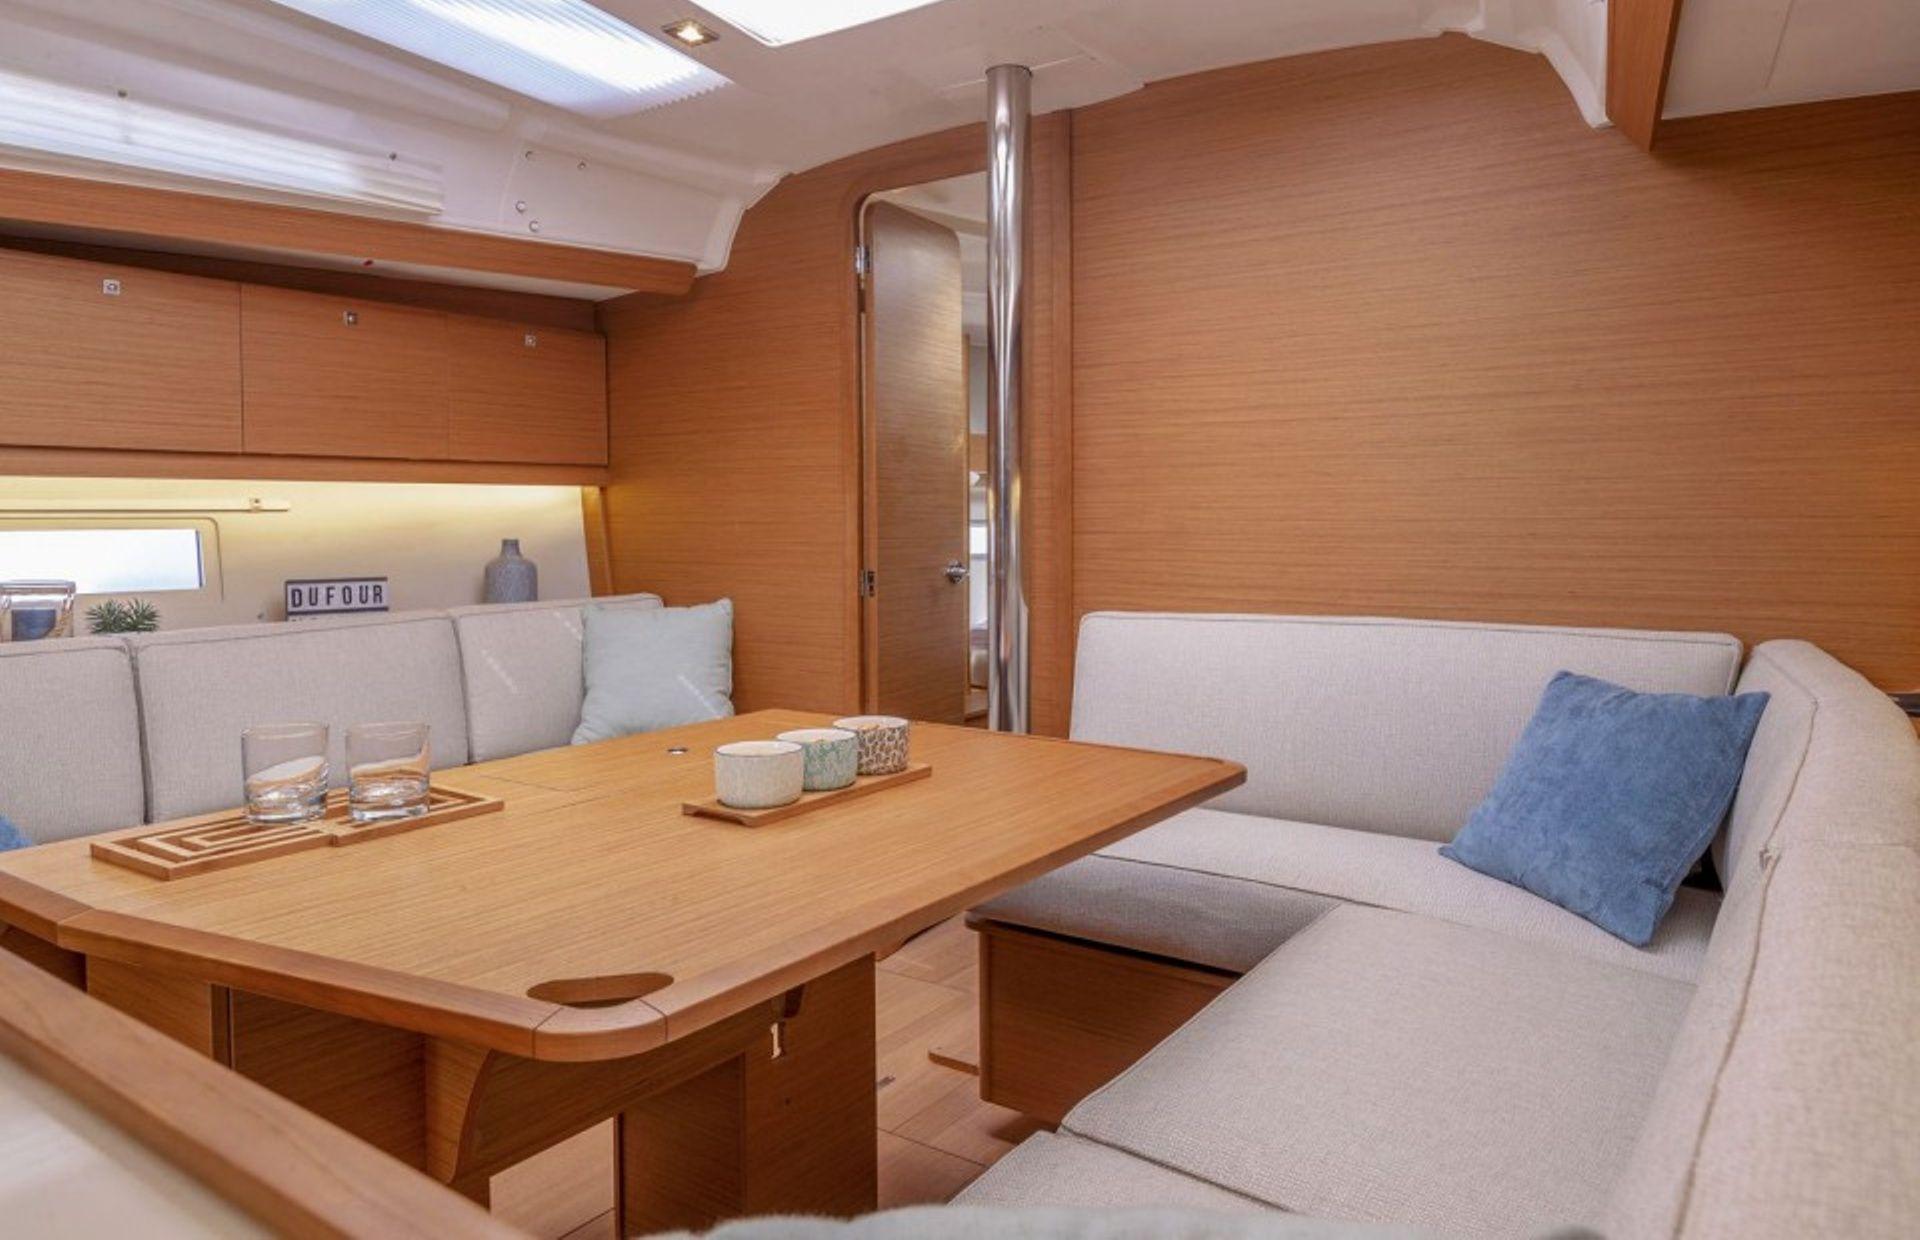 https://media.insailing.com/boat/dufour-453/image_1567594505090.jpg